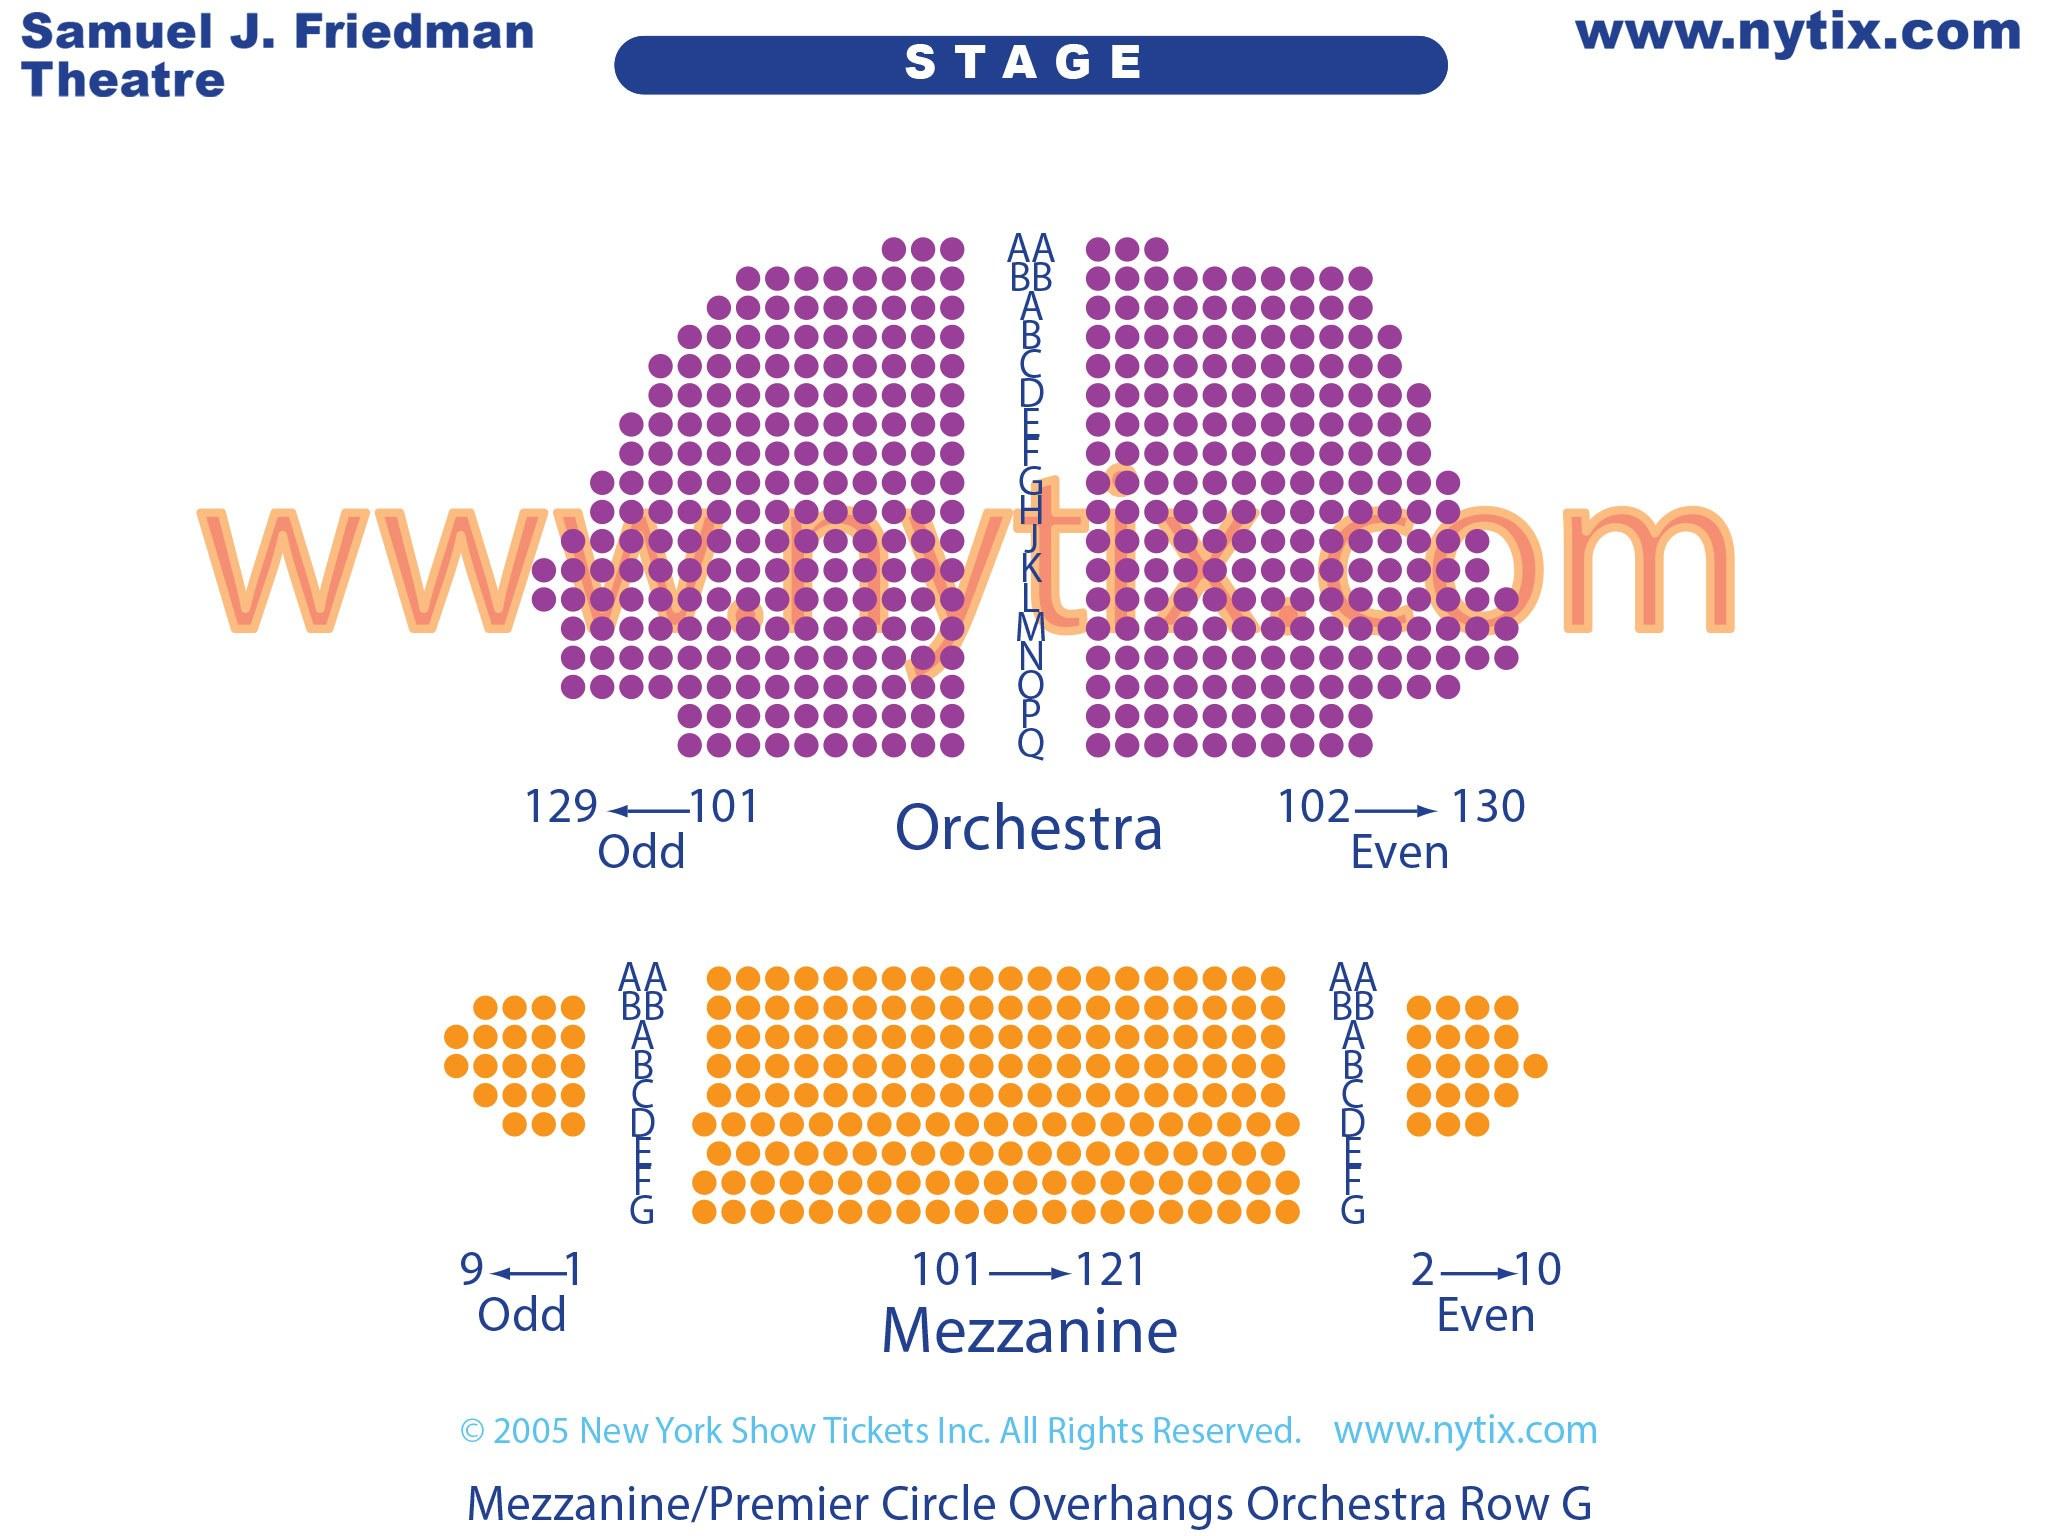 Samuel J Friedman Theatre Seating Chart